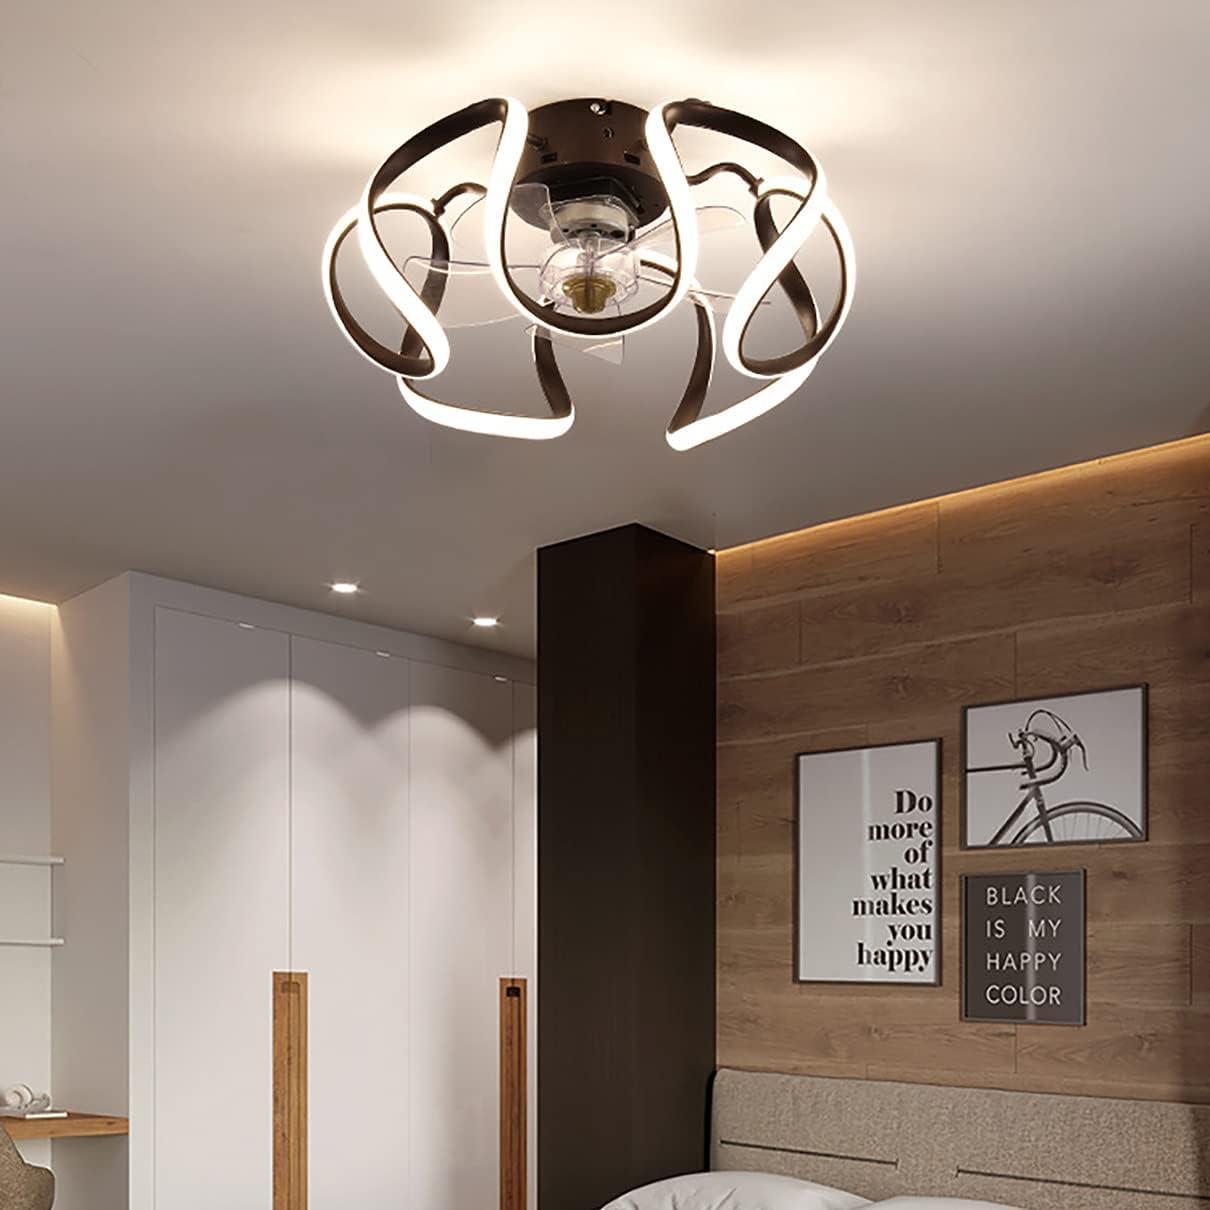 LED Ventilador Techo Con Luz Y Mando 3 Velocidades Dormitorio Regulable Lamparas Ventilador De Techo Con Temporizador Φ50cm Moderno Silencioso Ventilador Techo Con Luz 60W